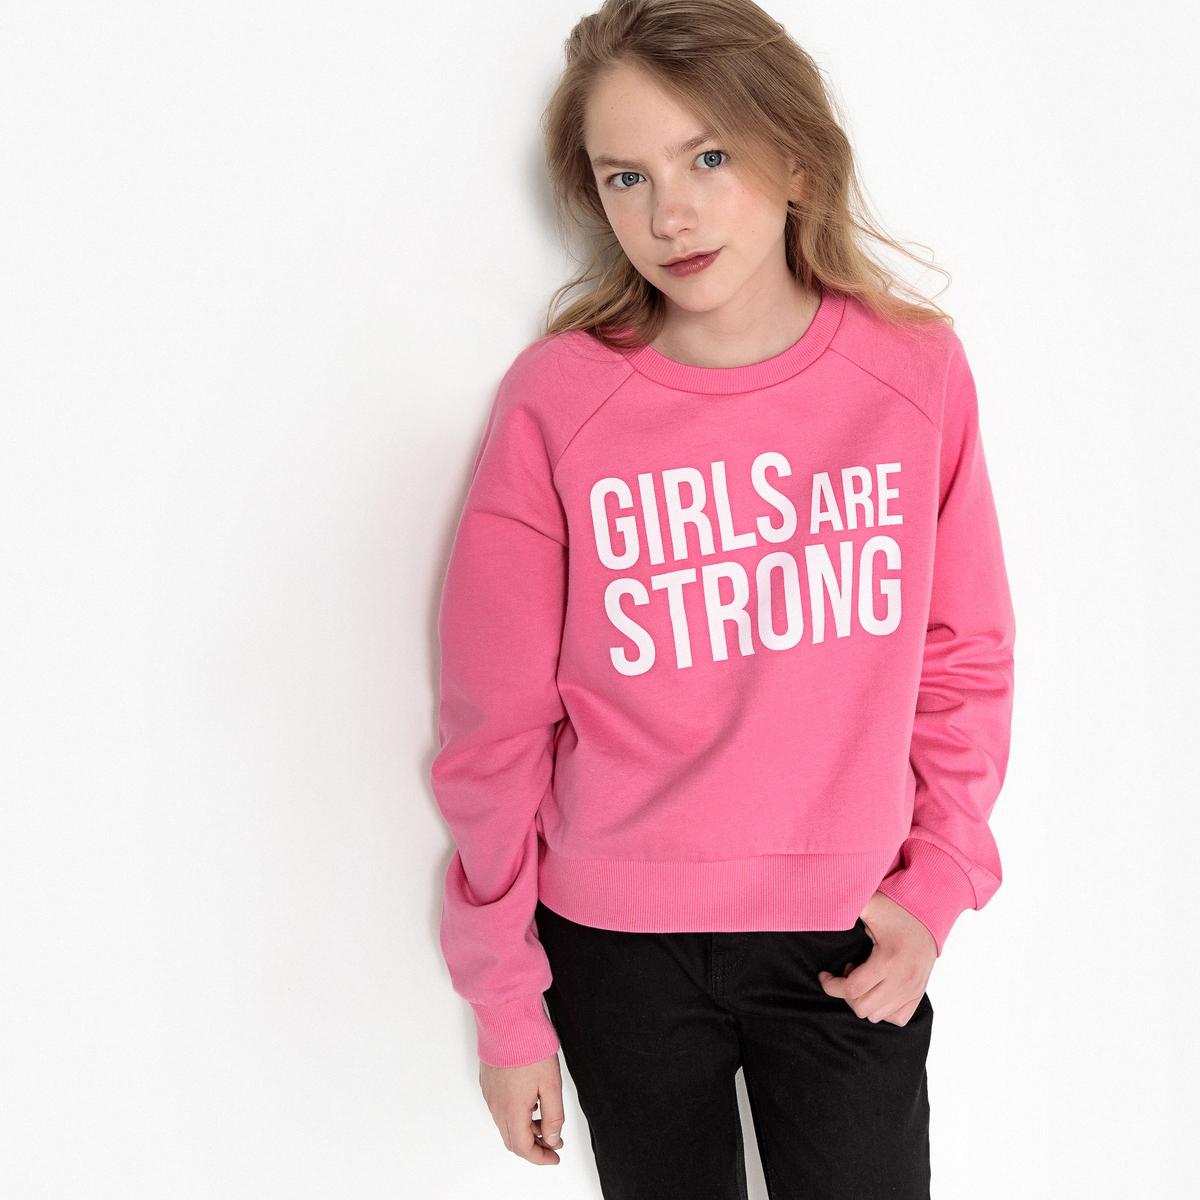 цена Свитшот La Redoute Короткий 16 лет - 162 см розовый онлайн в 2017 году